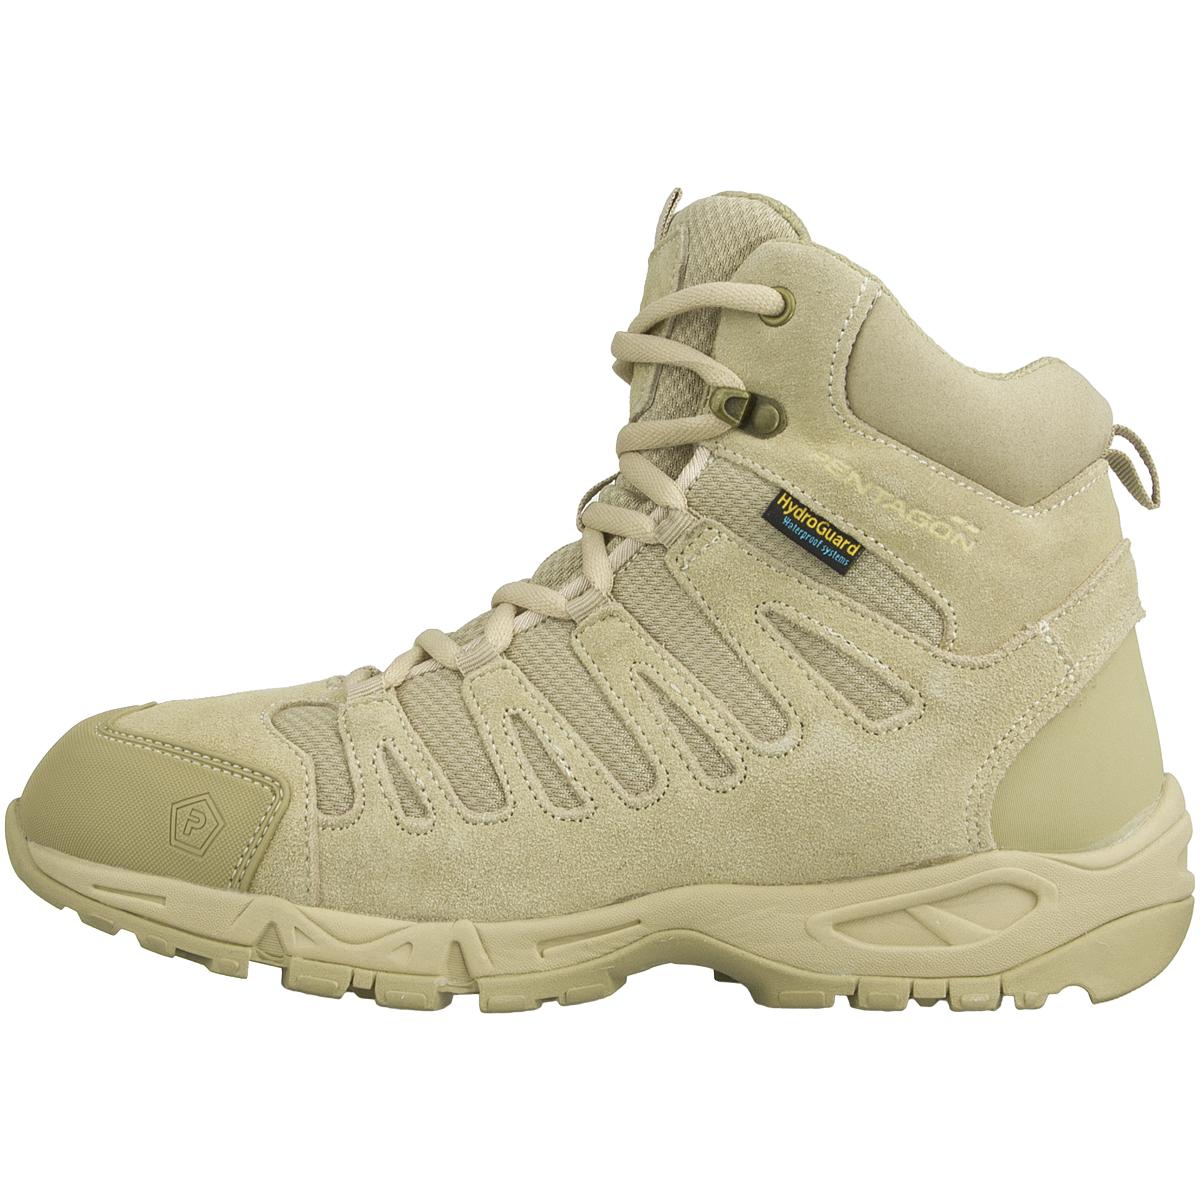 "Pentagon Achilles 6/"" Trekking Boots Tactical Army Hunting Footwear Desert Tan"